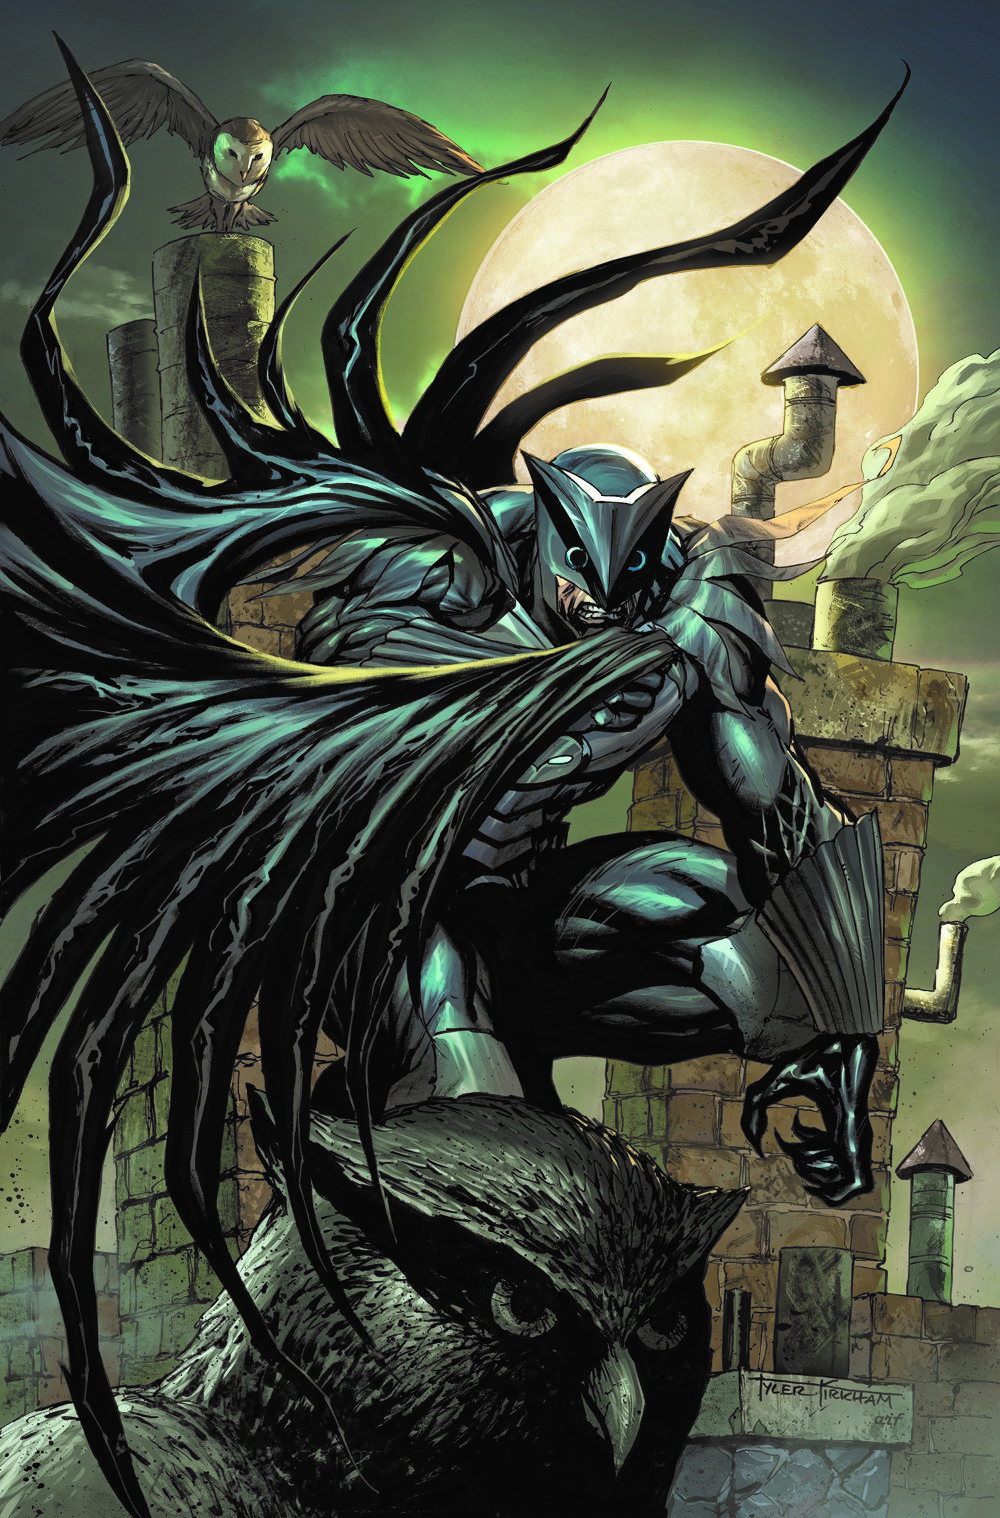 Crime-Syndicate-2-variant-Kirkham DC Comics April 2021 Solicitations